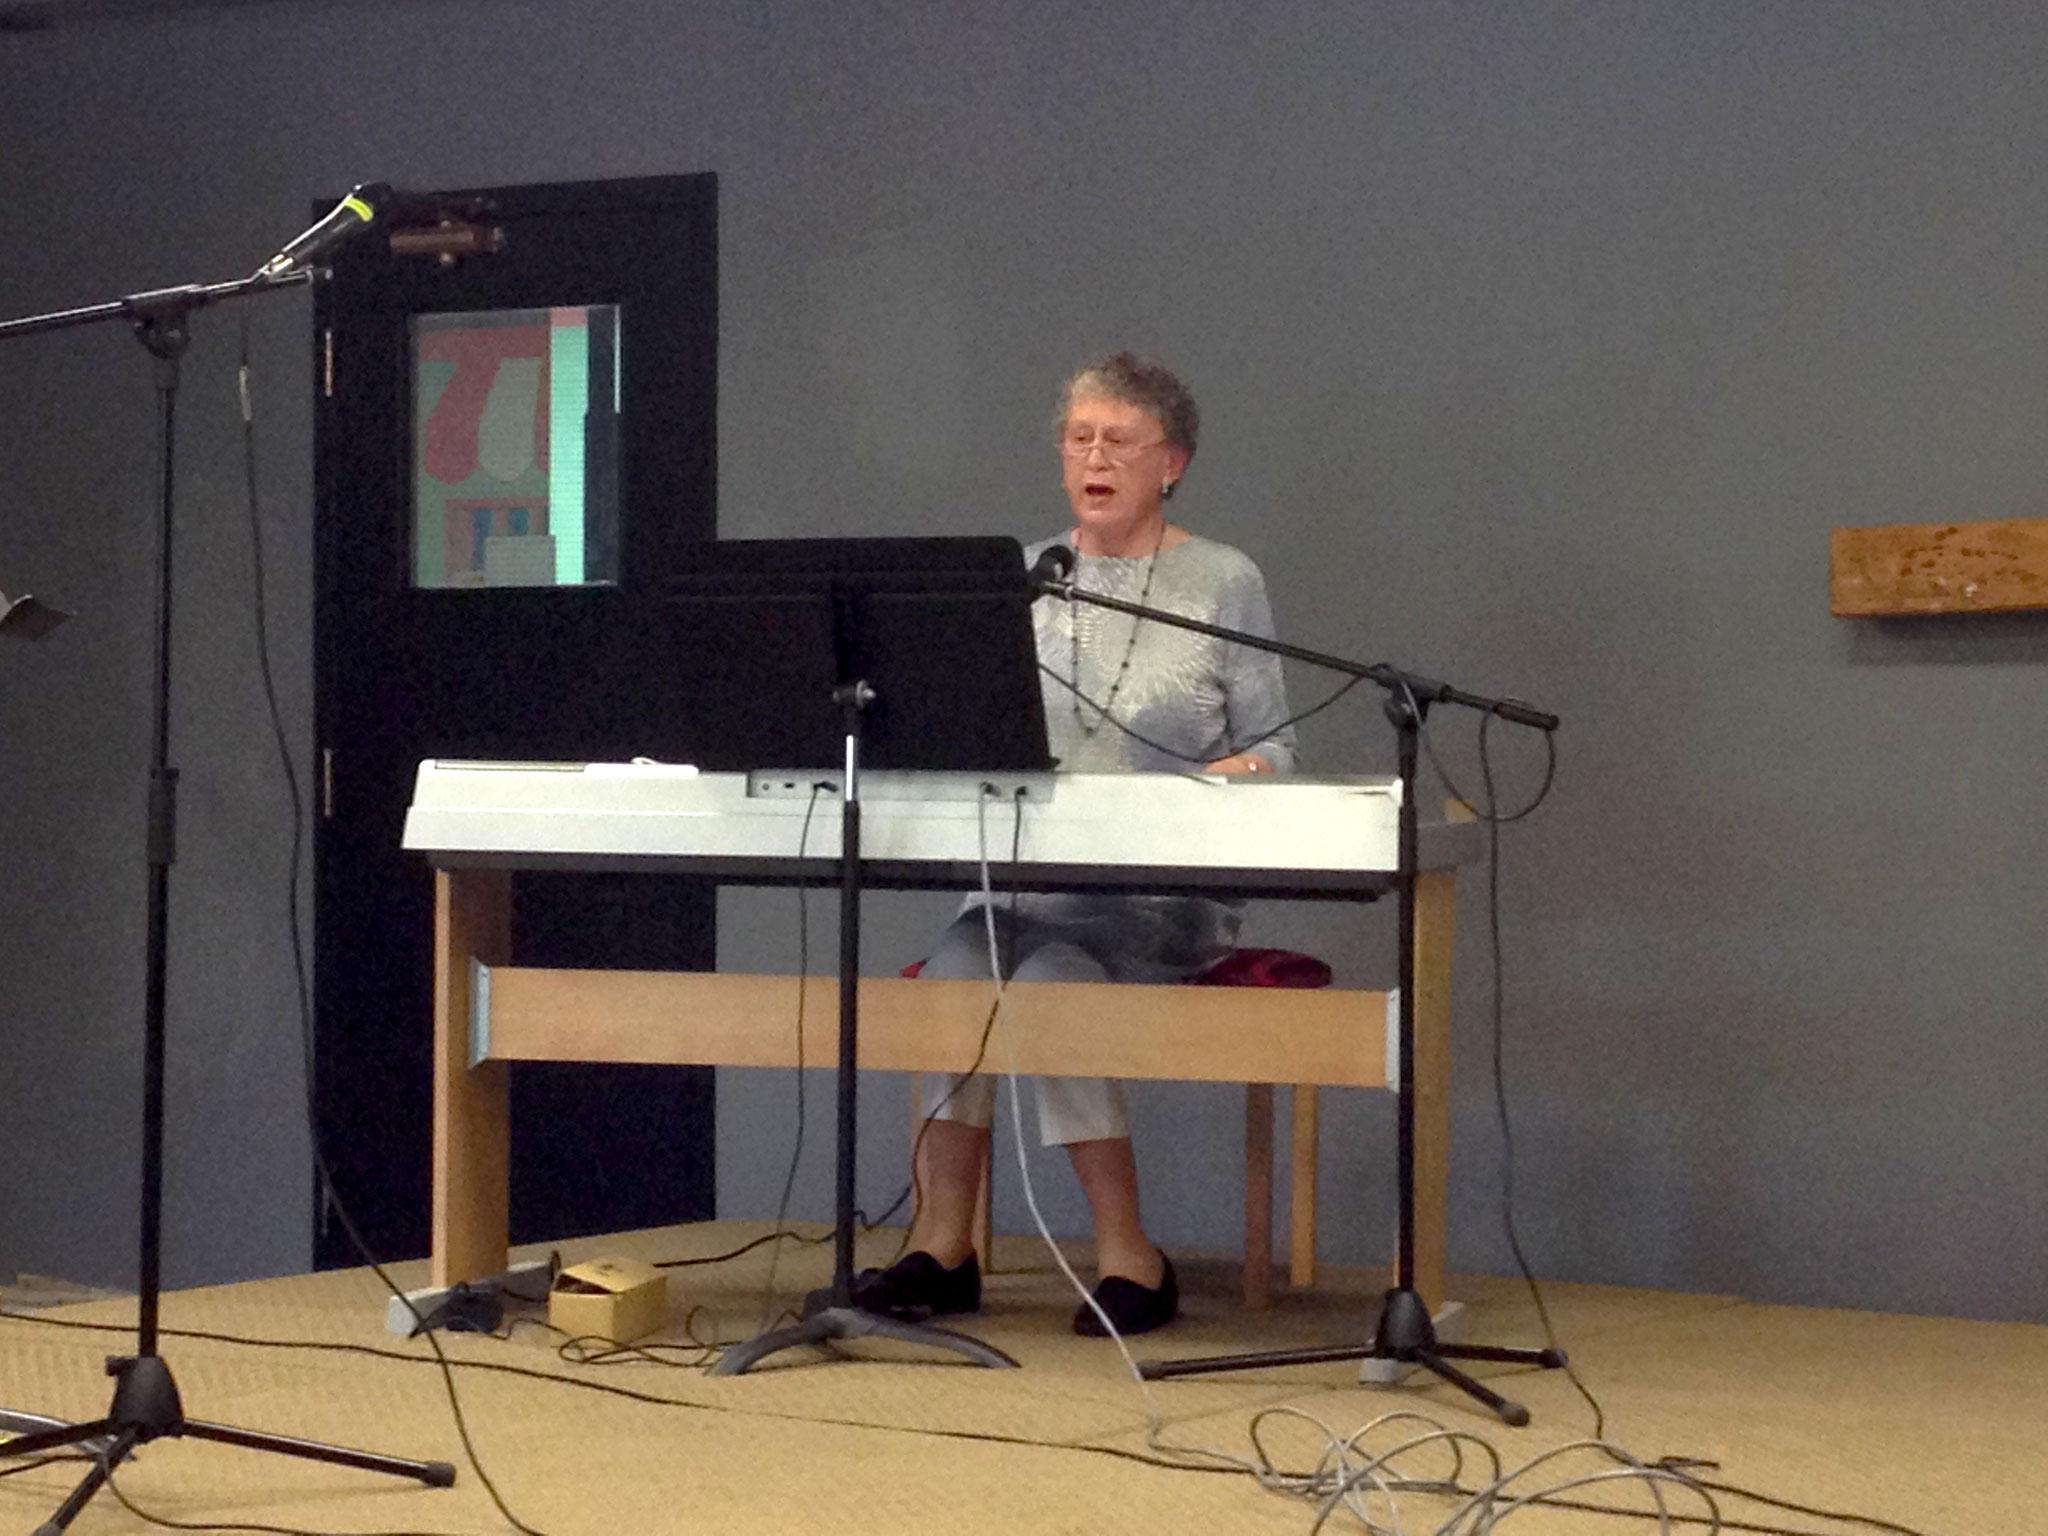 Rev. Marjorie Mizuno's special worship